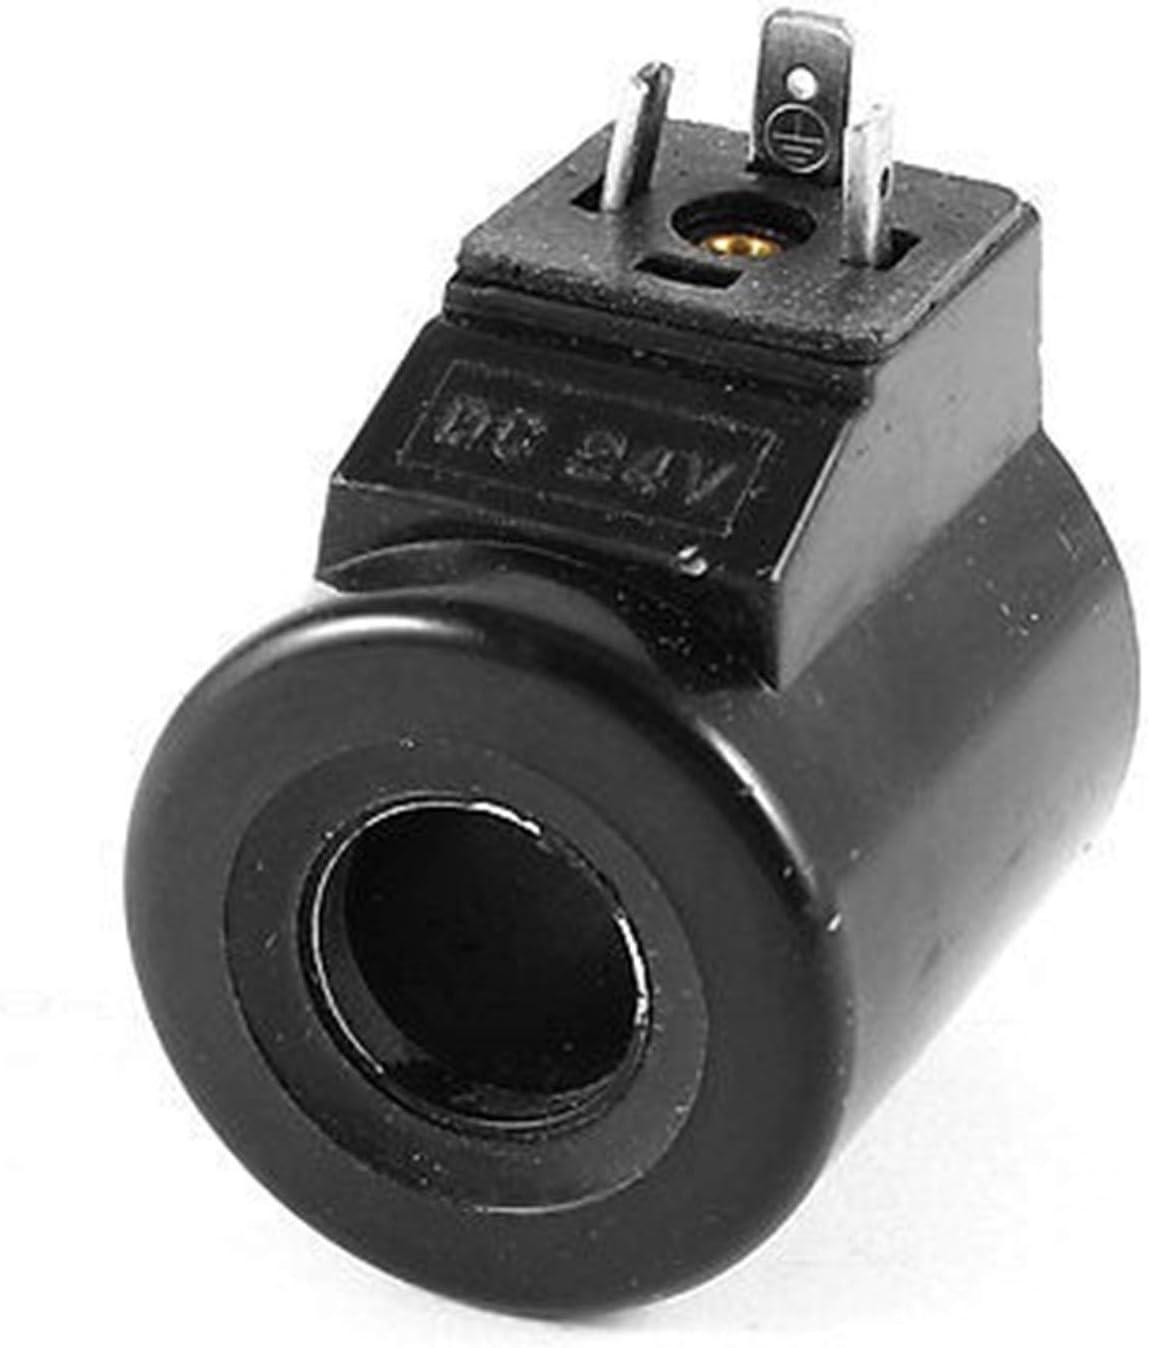 Electroválvula mecánica 24 V CC 36V / 110V / 220V / 380VAC 20 mm Núcleo Dia neumática de control de aire de la válvula electromagnética de la bobina de 12V / 53mm Altura Control de válvulas de gas y l